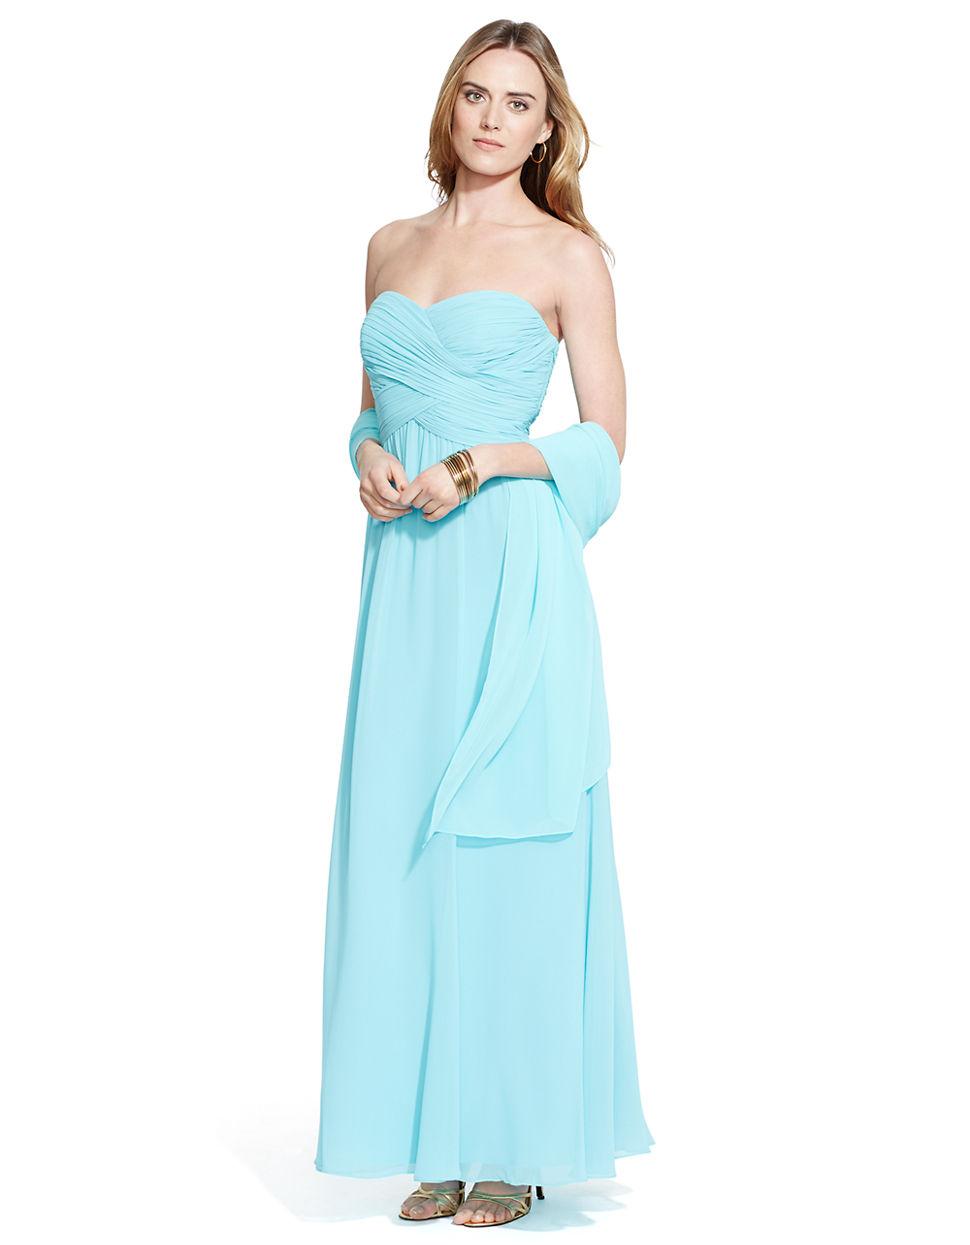 Beautiful Ralph Lauren Bridal Gowns Photo - All Wedding Dresses ...